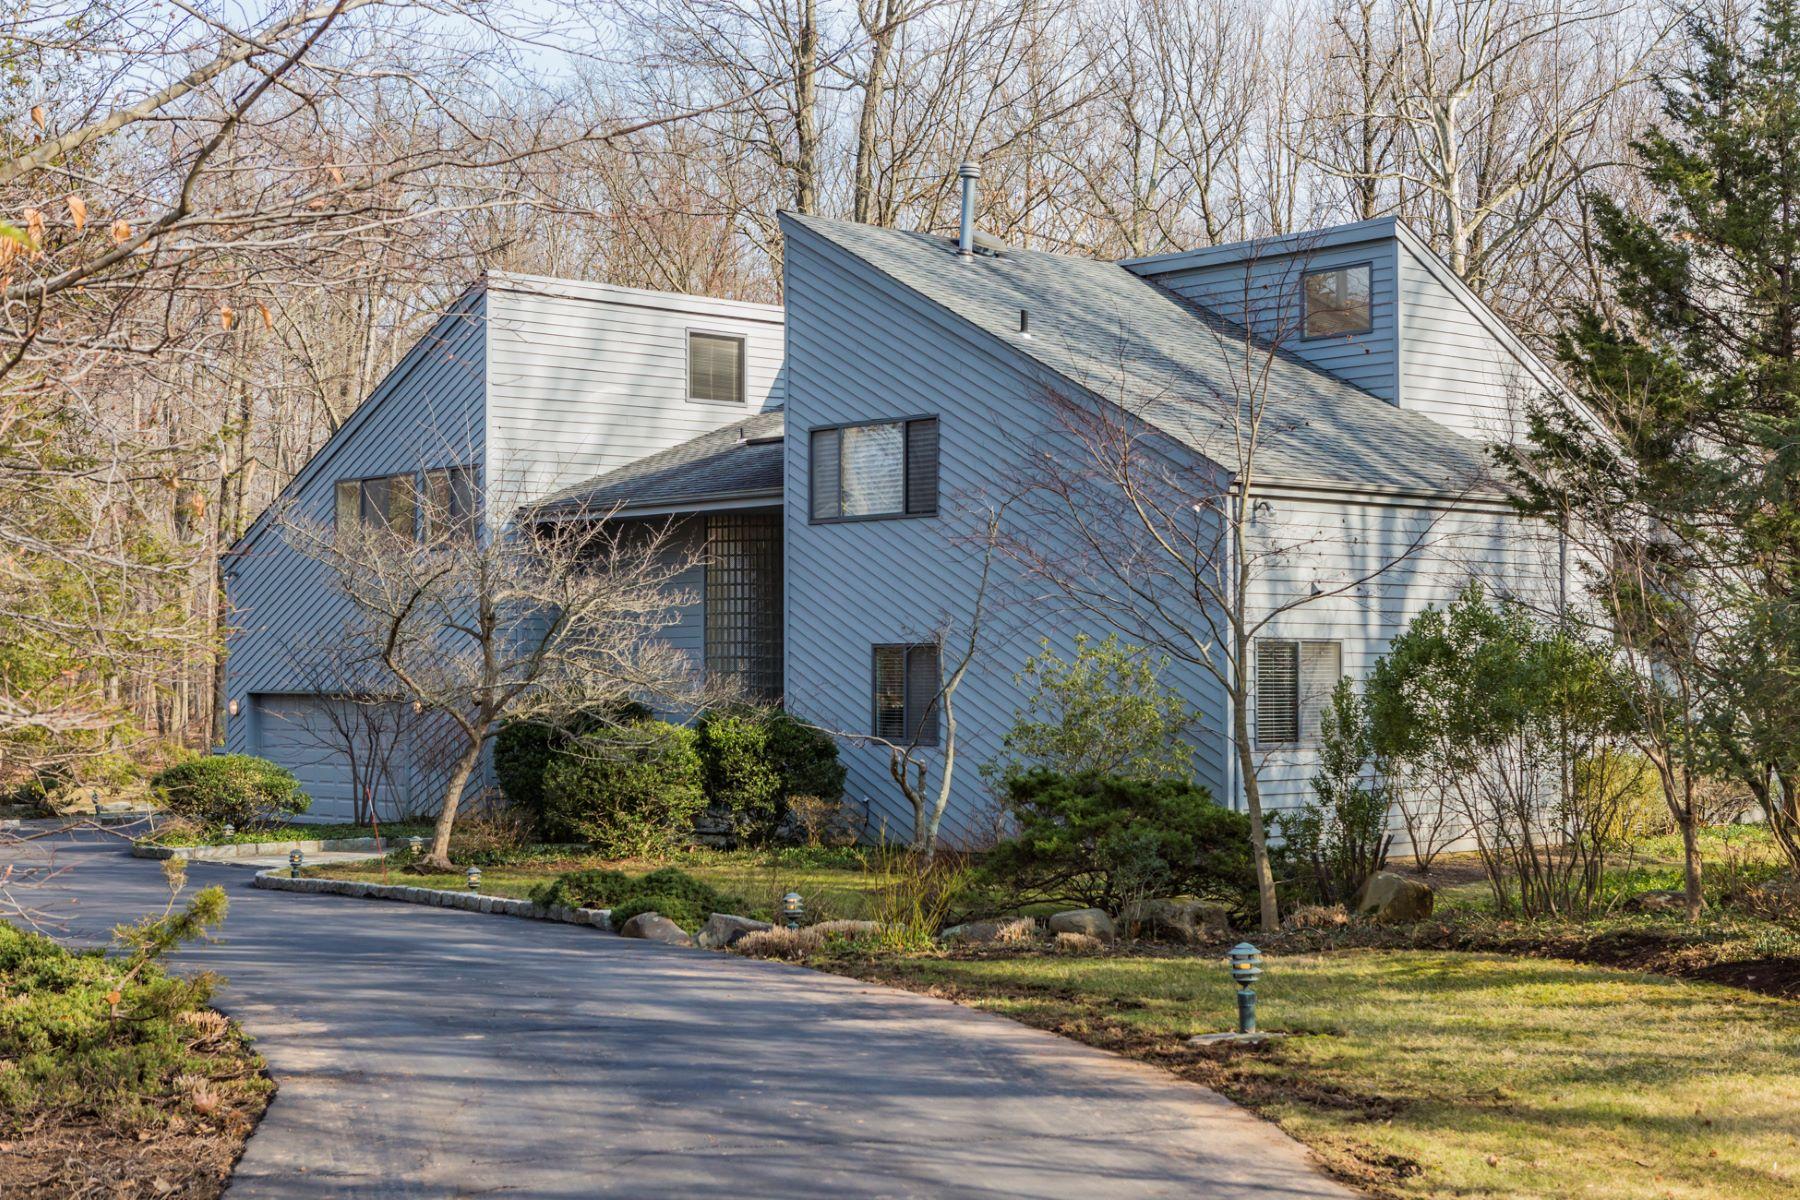 Maison unifamiliale pour l Vente à Inspired Gardens and the Poetry of Light 95 Montadale Drive Princeton, New Jersey, 08540 États-Unis